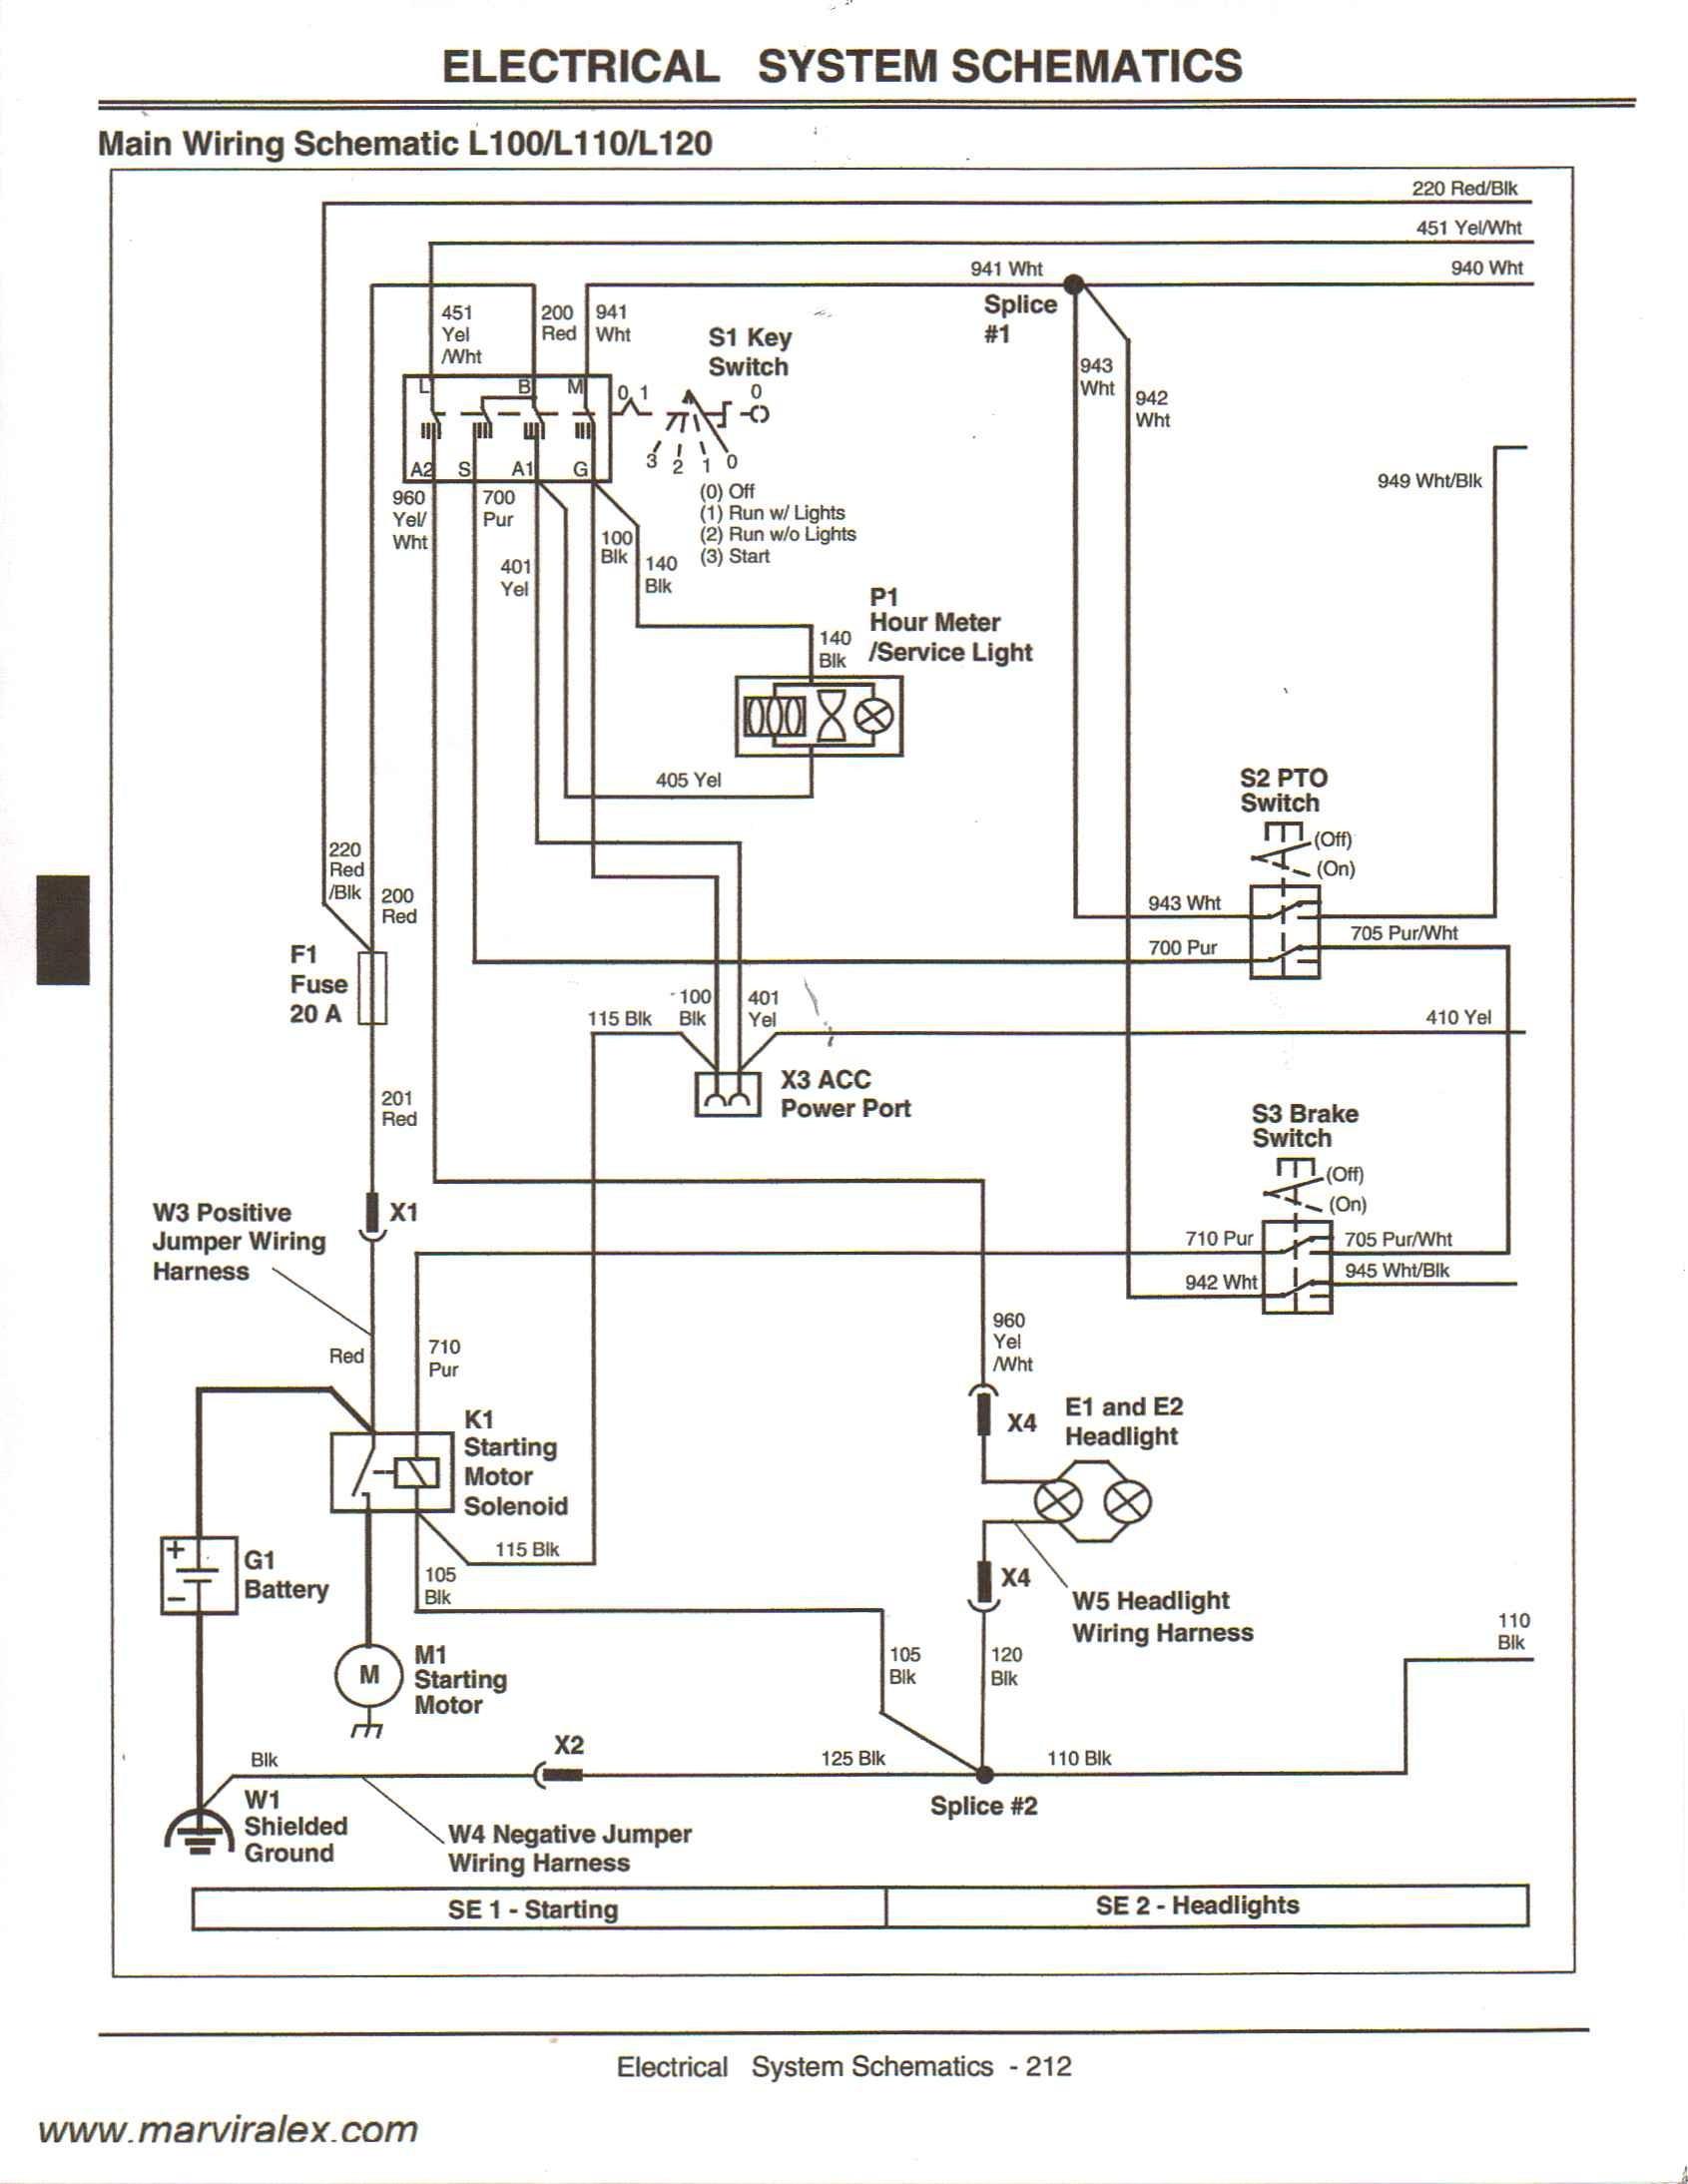 [XOTG_4463]  Jd 314 Wiring Diagram - Gm Dome Light Wiring Diagram for Wiring Diagram  Schematics | John Deere 160 Wiring Diagram |  | Wiring Diagram Schematics